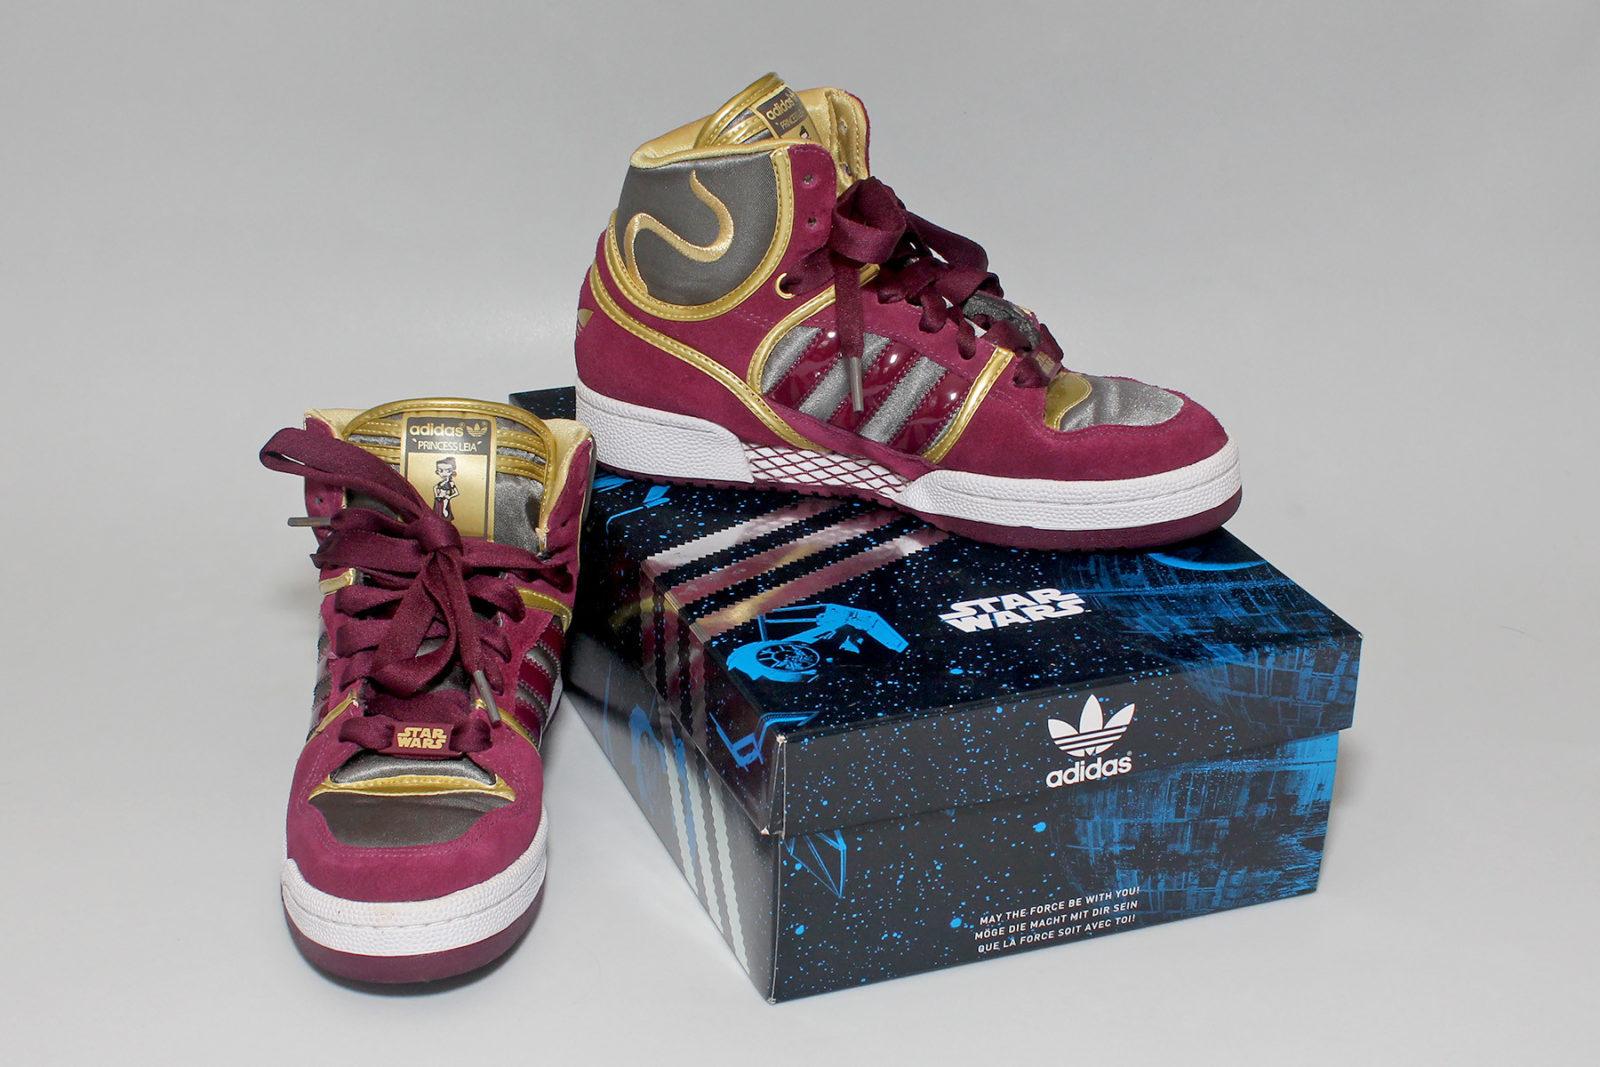 Women's Adidas x Star Wars Princess Leia sneakers